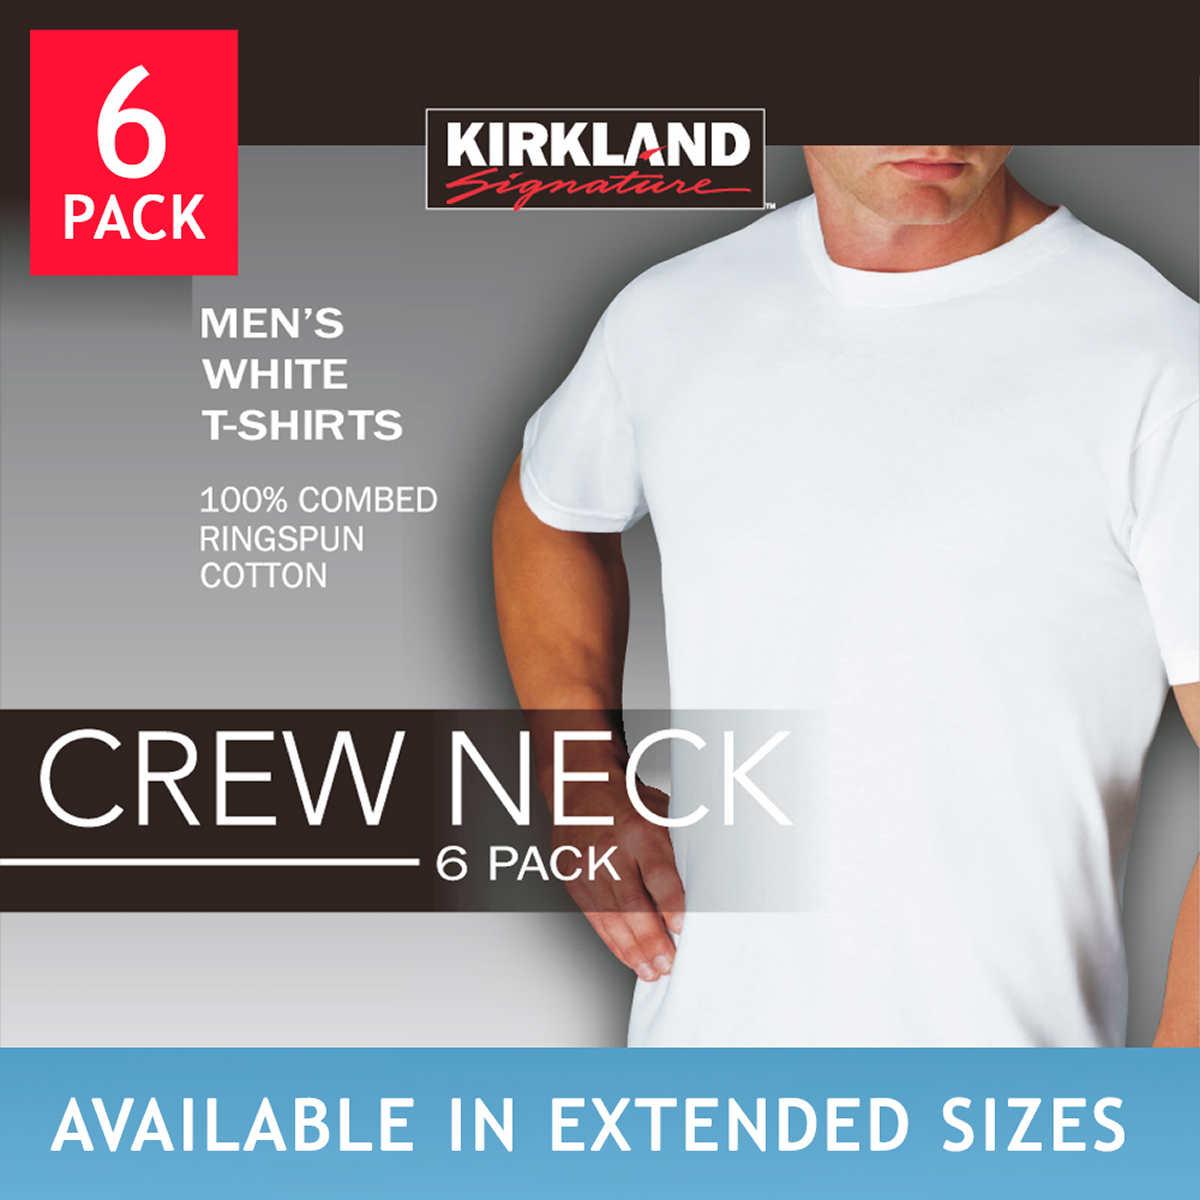 Kirkland Signature Men's Crew Neck Tee 4-pack, Black